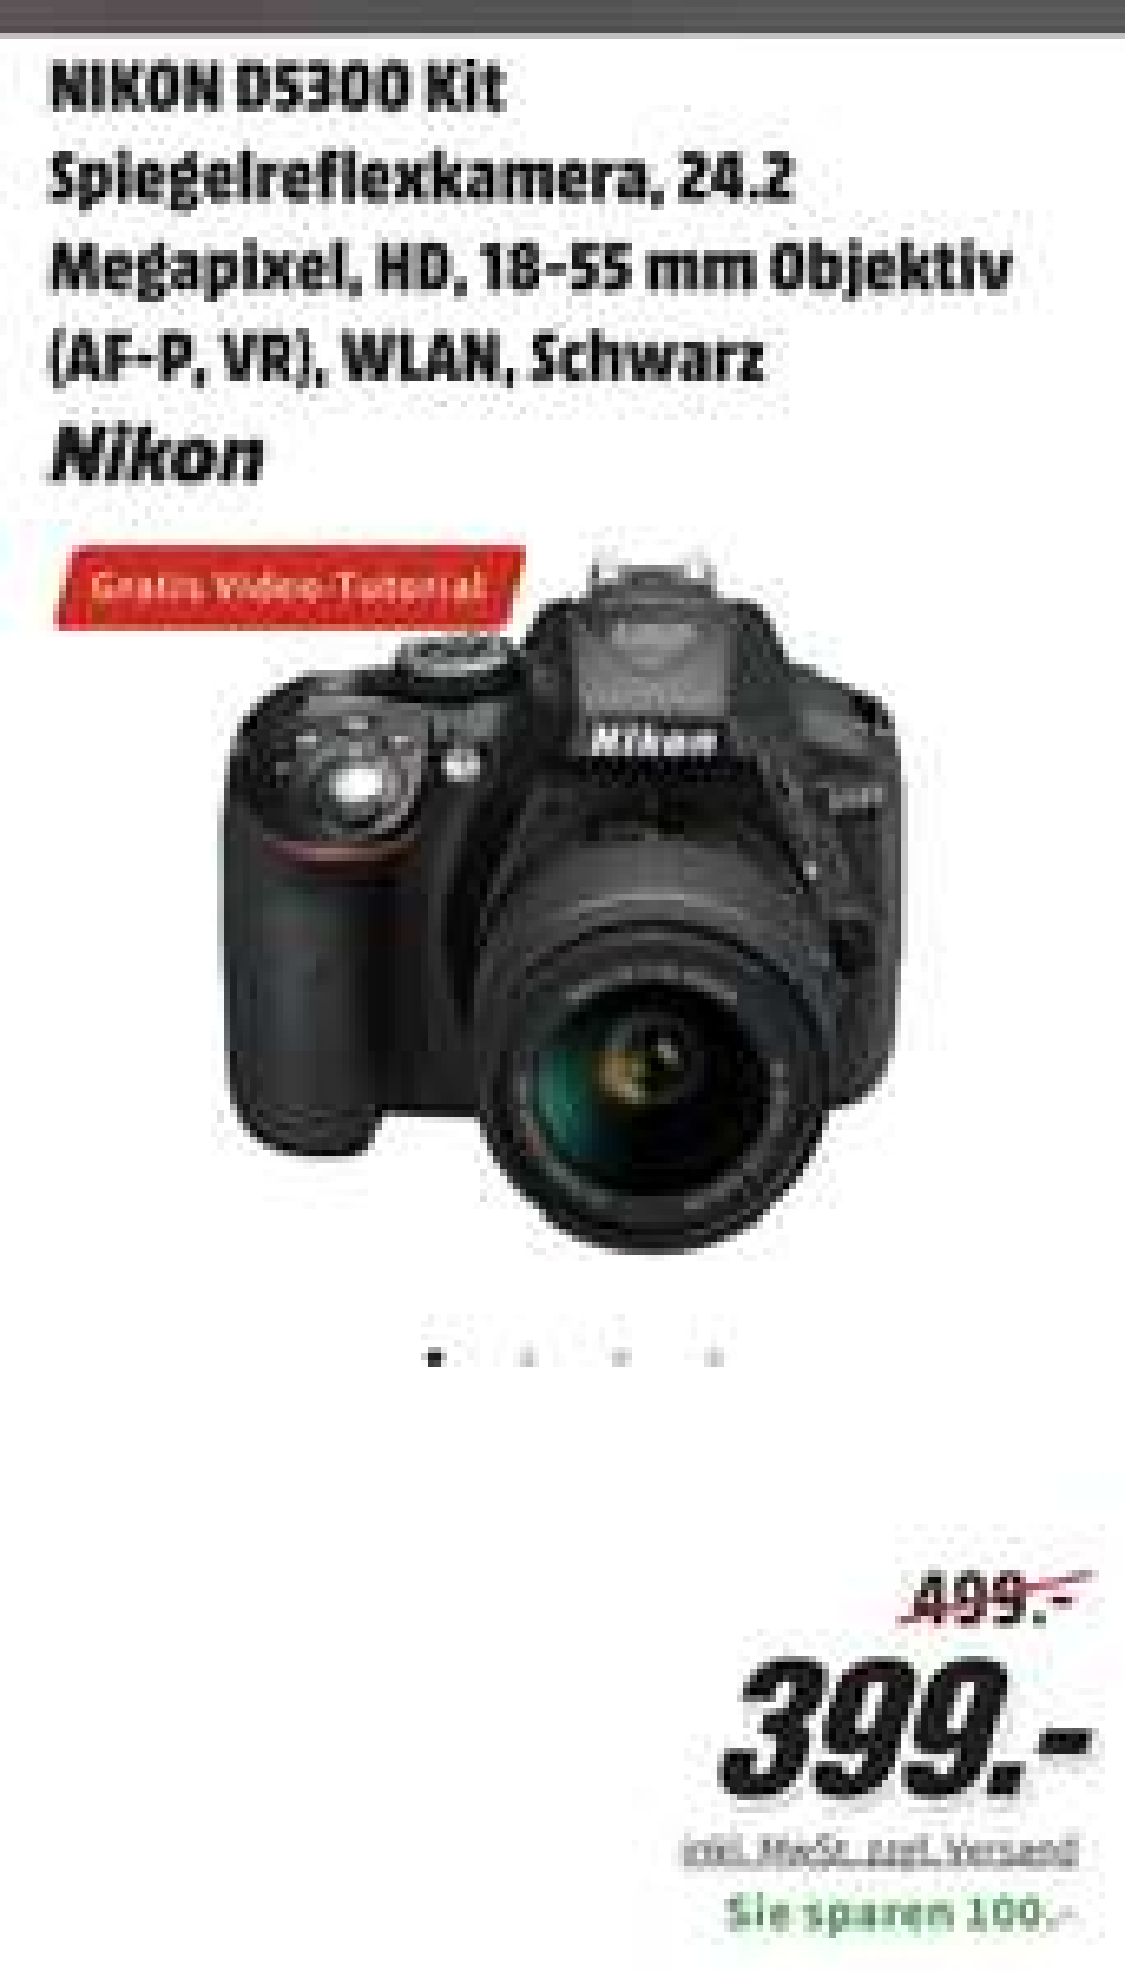 NIKON D5300 Kit Spiegelreflexkamera, 18-55 mm Objektiv